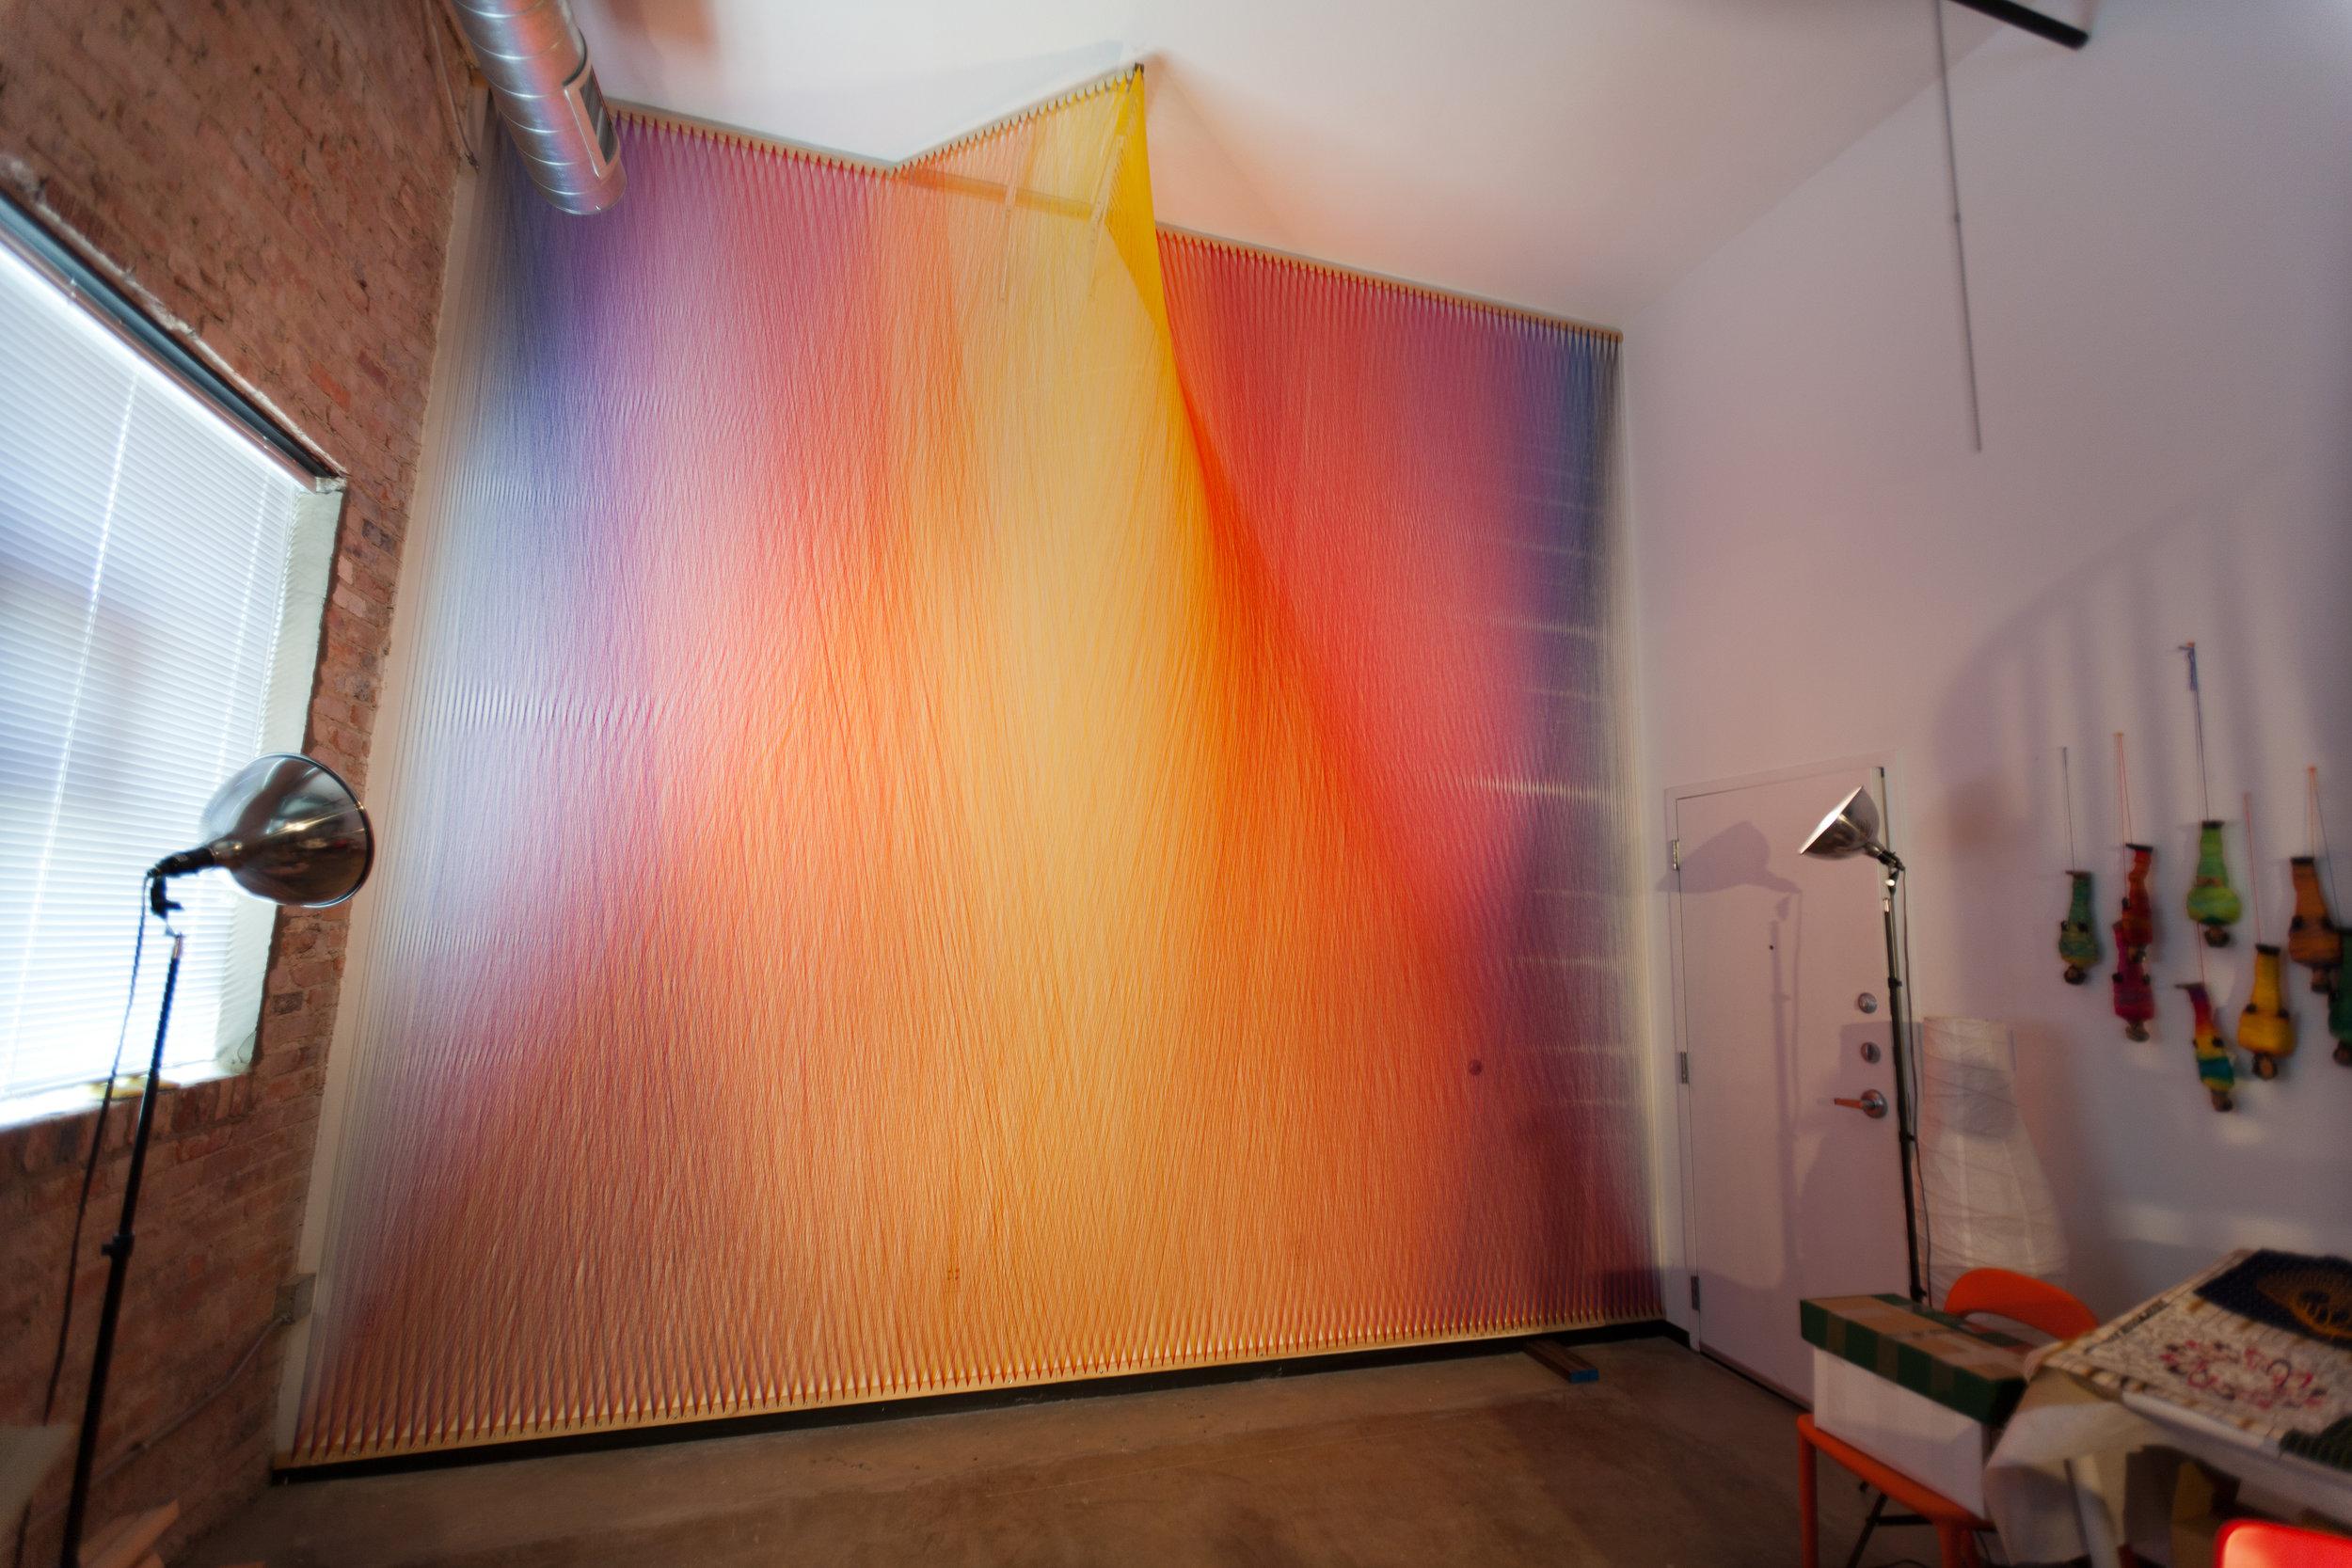 Plexus no. 1 + site-specific installation at Centraltrak, UT Dallas artist in residency program + thread, wood, and nails + 15' x 15' x 3' + 2010